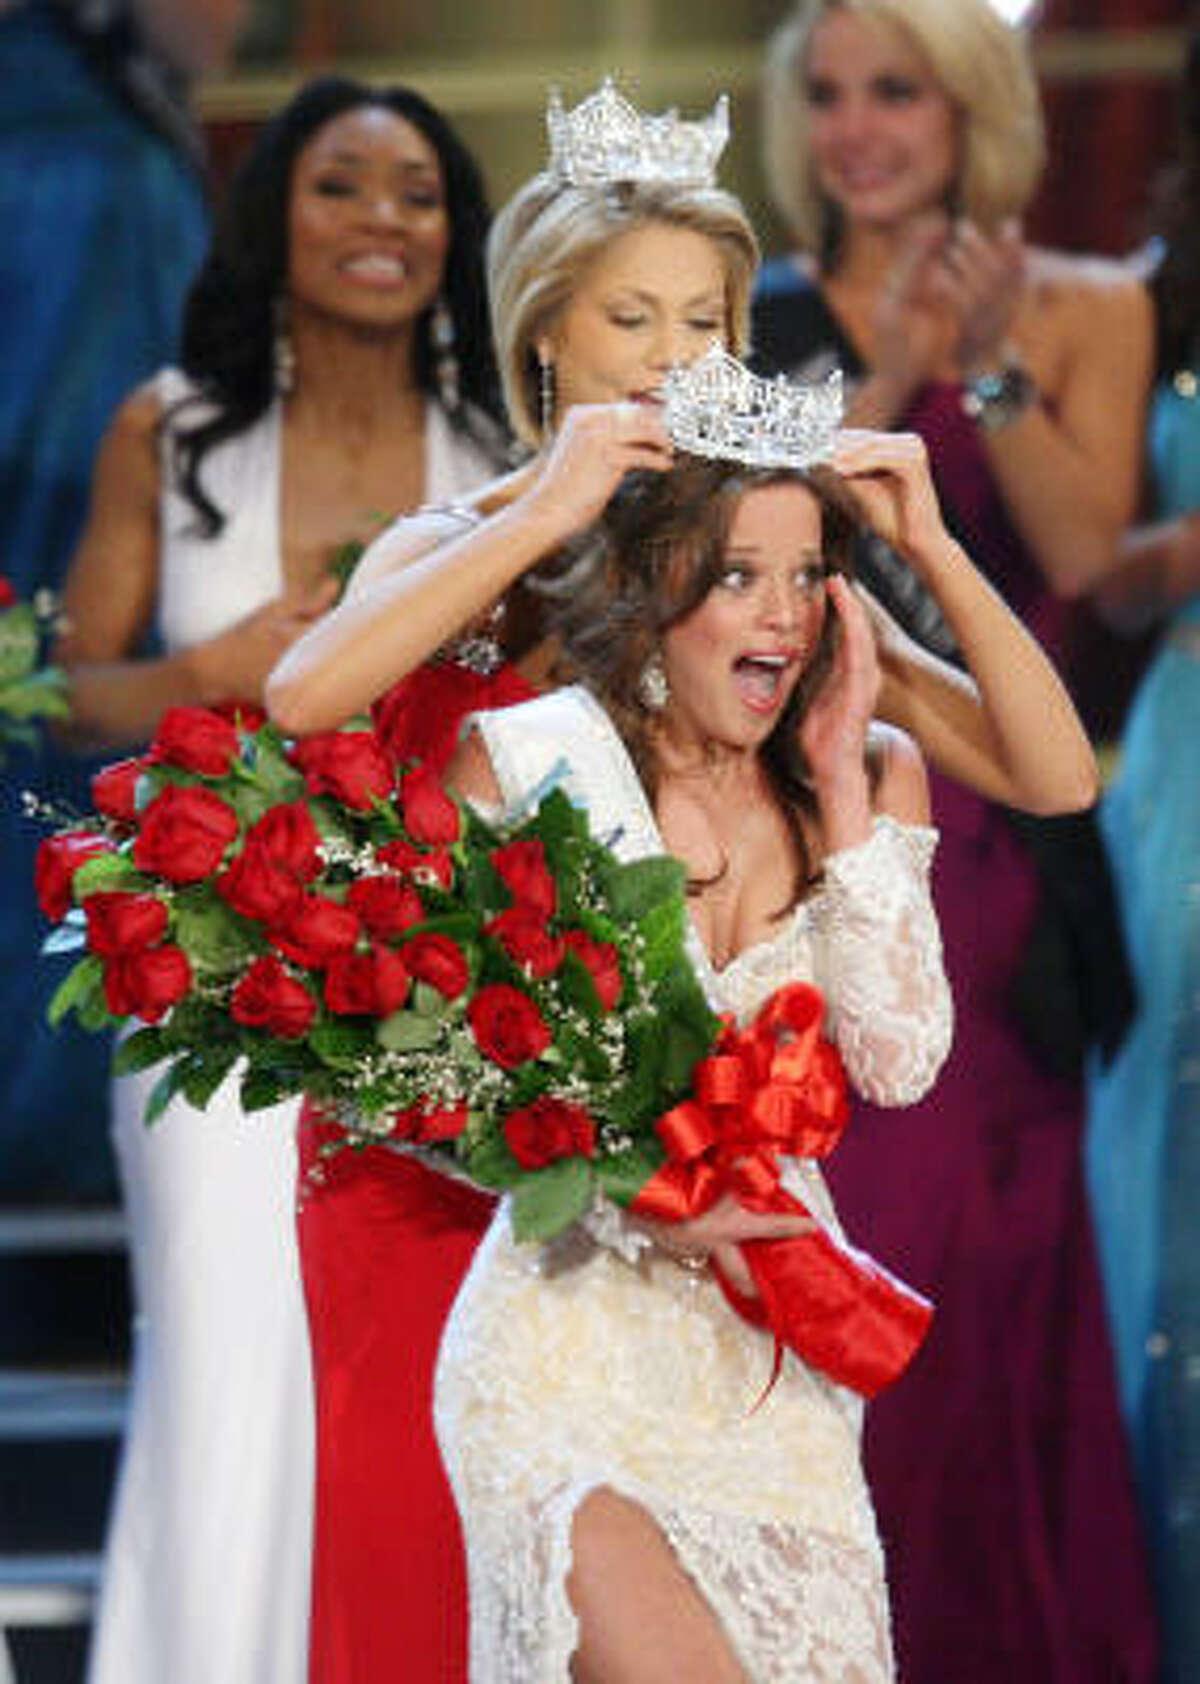 Miss America Katie Stam, of Indiana, tries on the tiara.